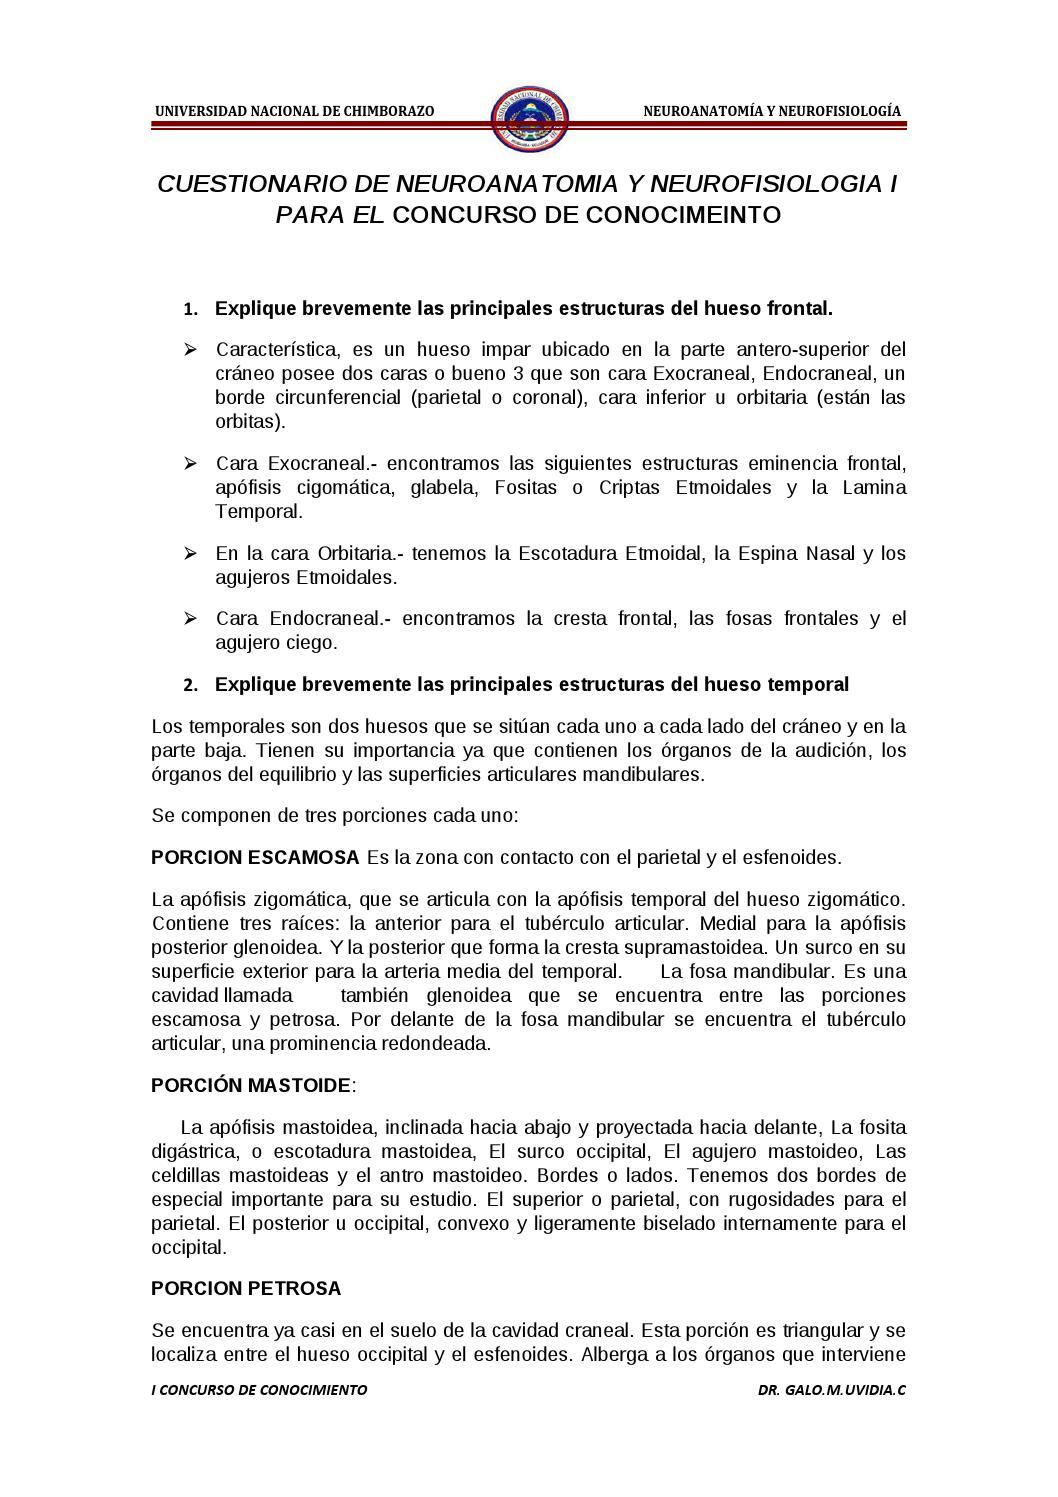 Cuestionario resuelto para primero by Galo Uvidia - issuu